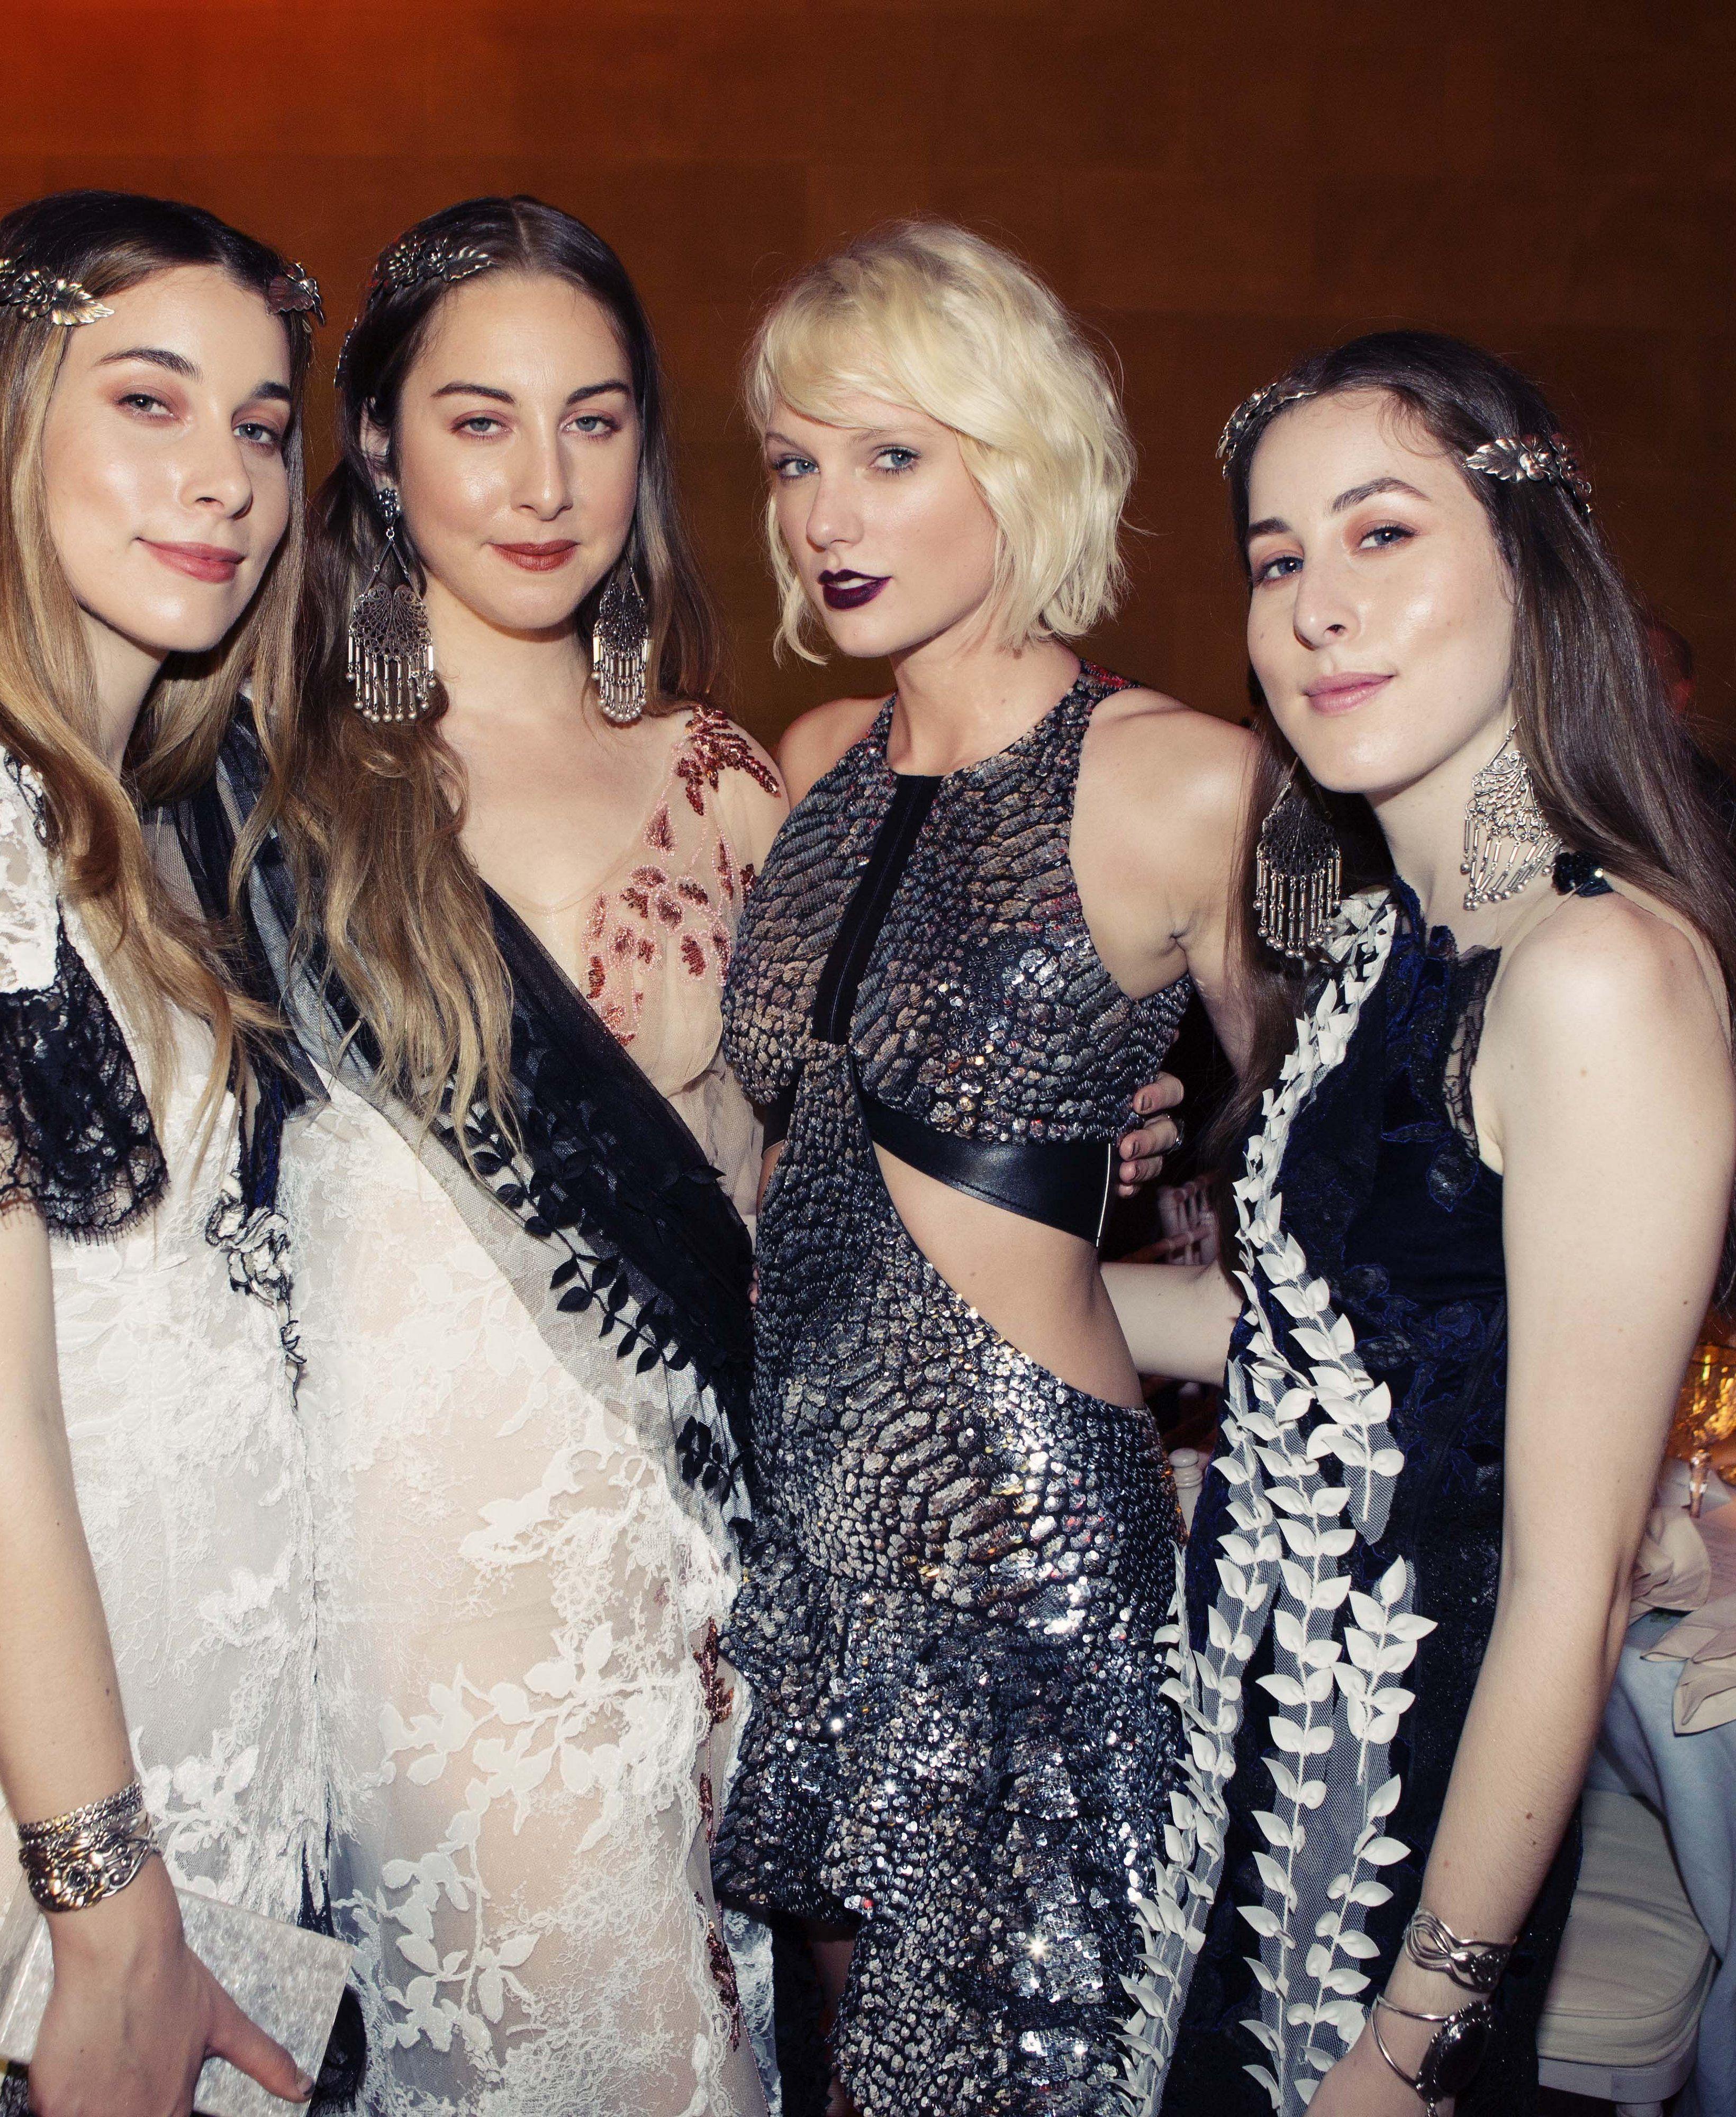 Inside the 2016 met gala fashionstyle high fashion gowns inside the 2016 met gala este haim danielle haim taylor swift and alana haim m4hsunfo